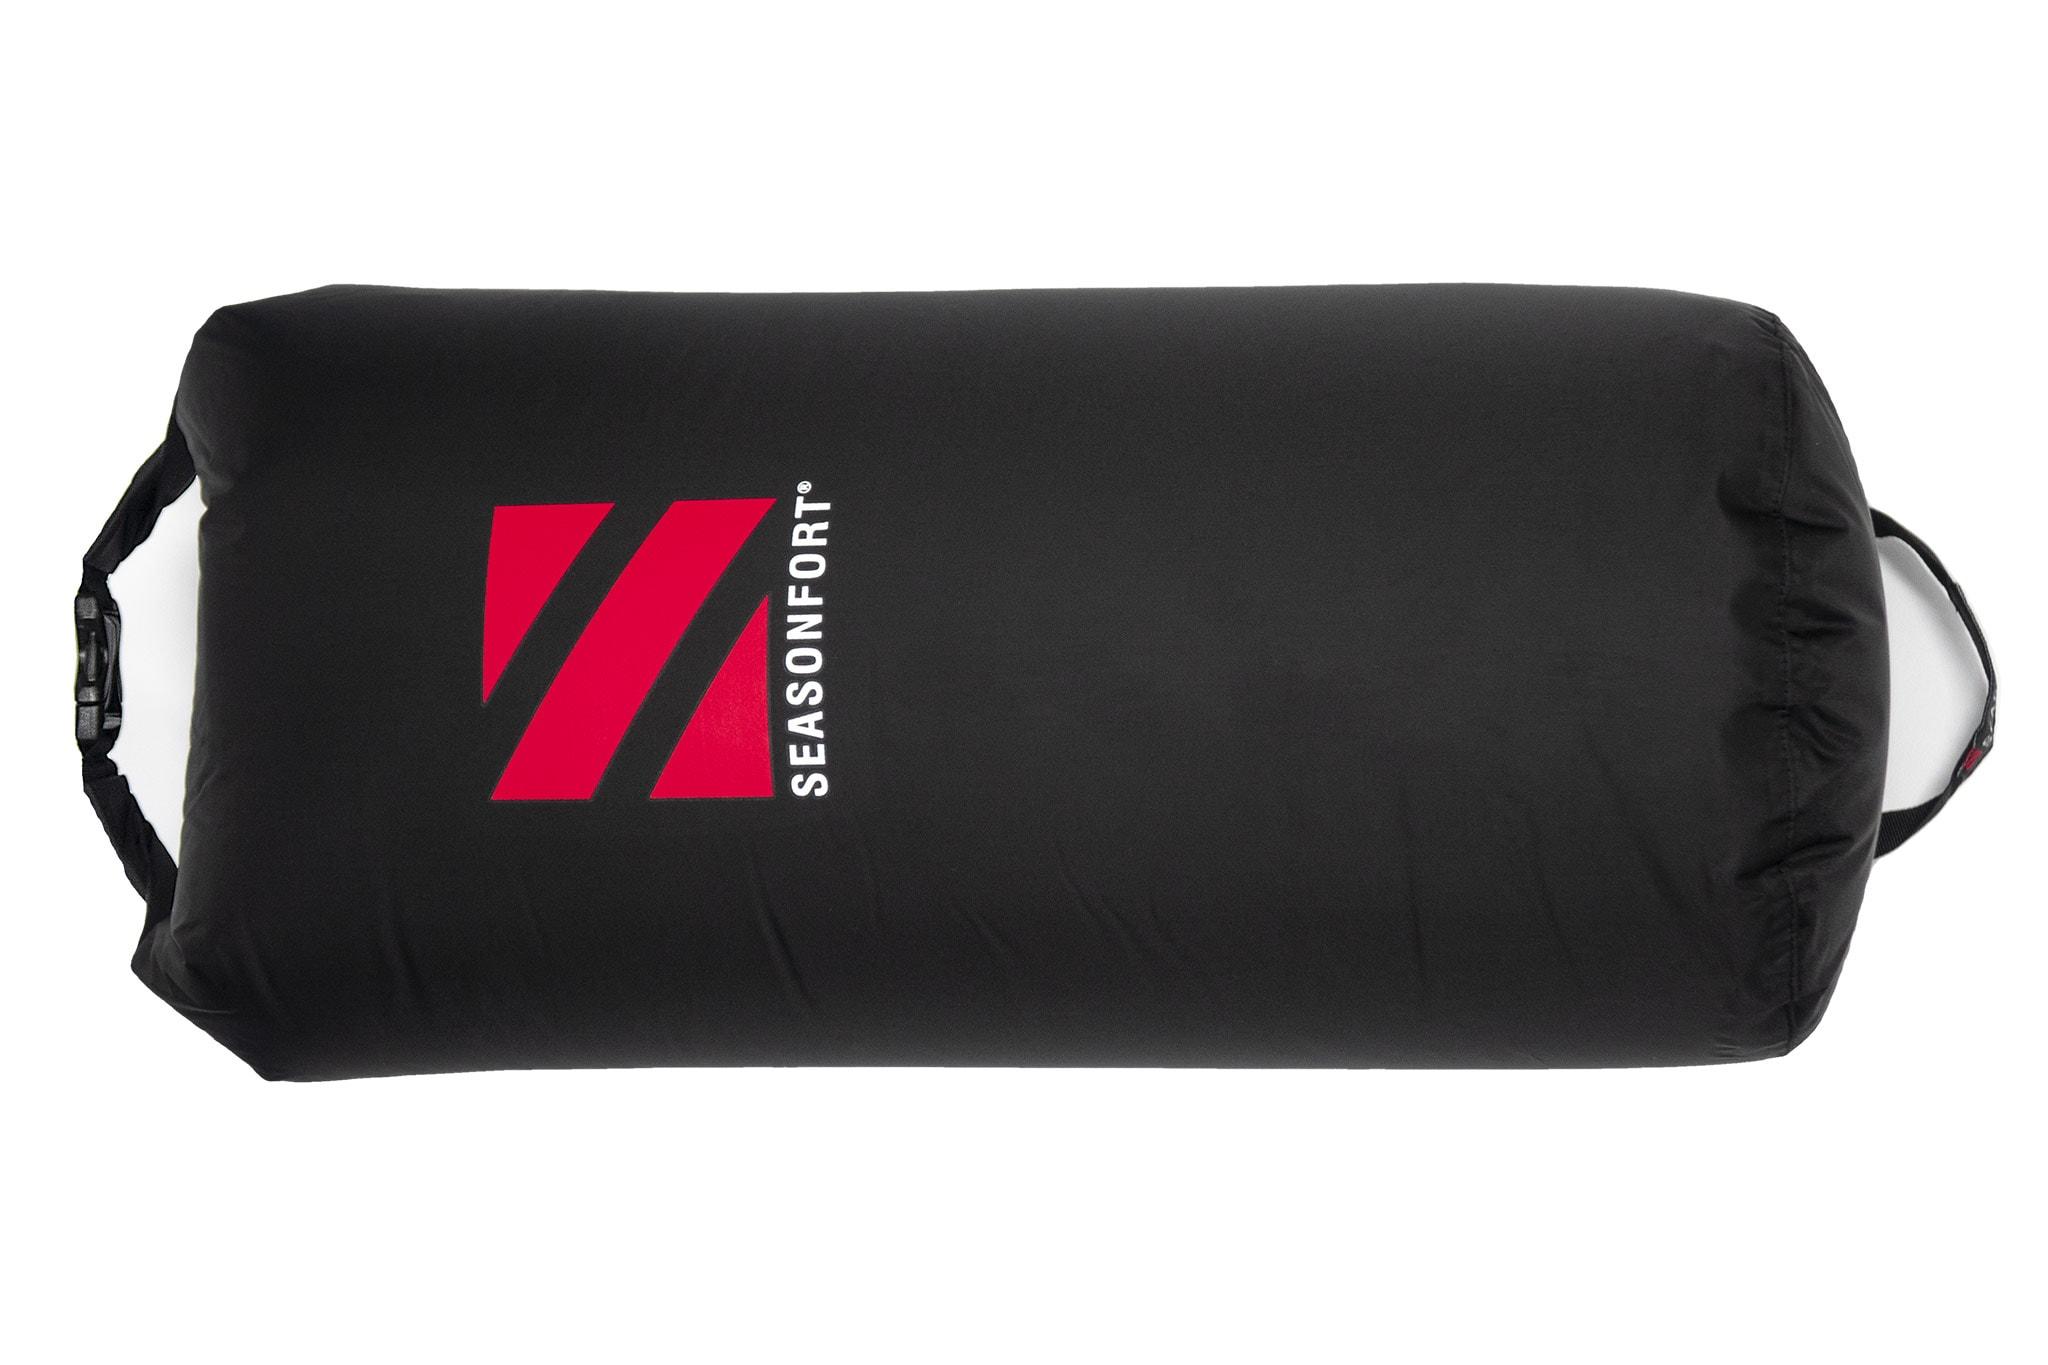 SEASONFORT Dry Bag